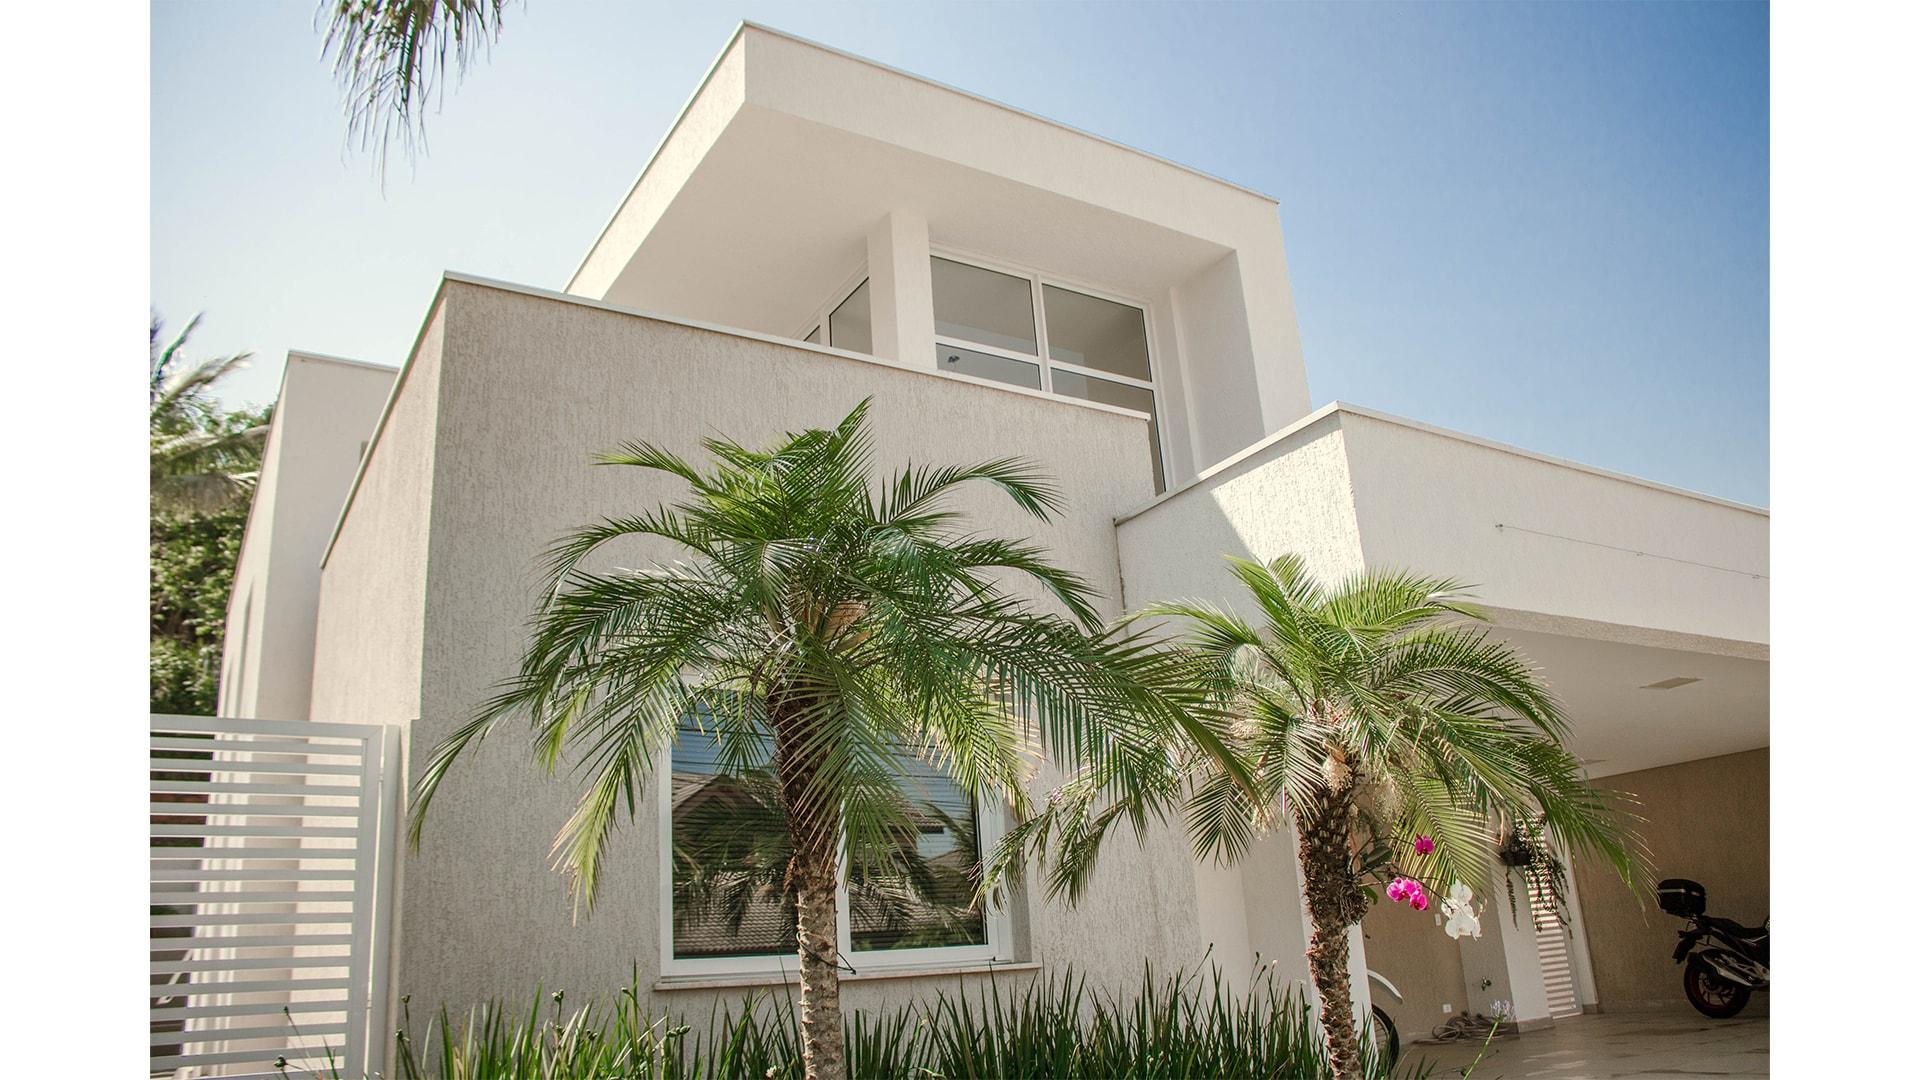 Residencial - 243m² - Res. Alphaville 12 - Santana de Parnaiba - SP